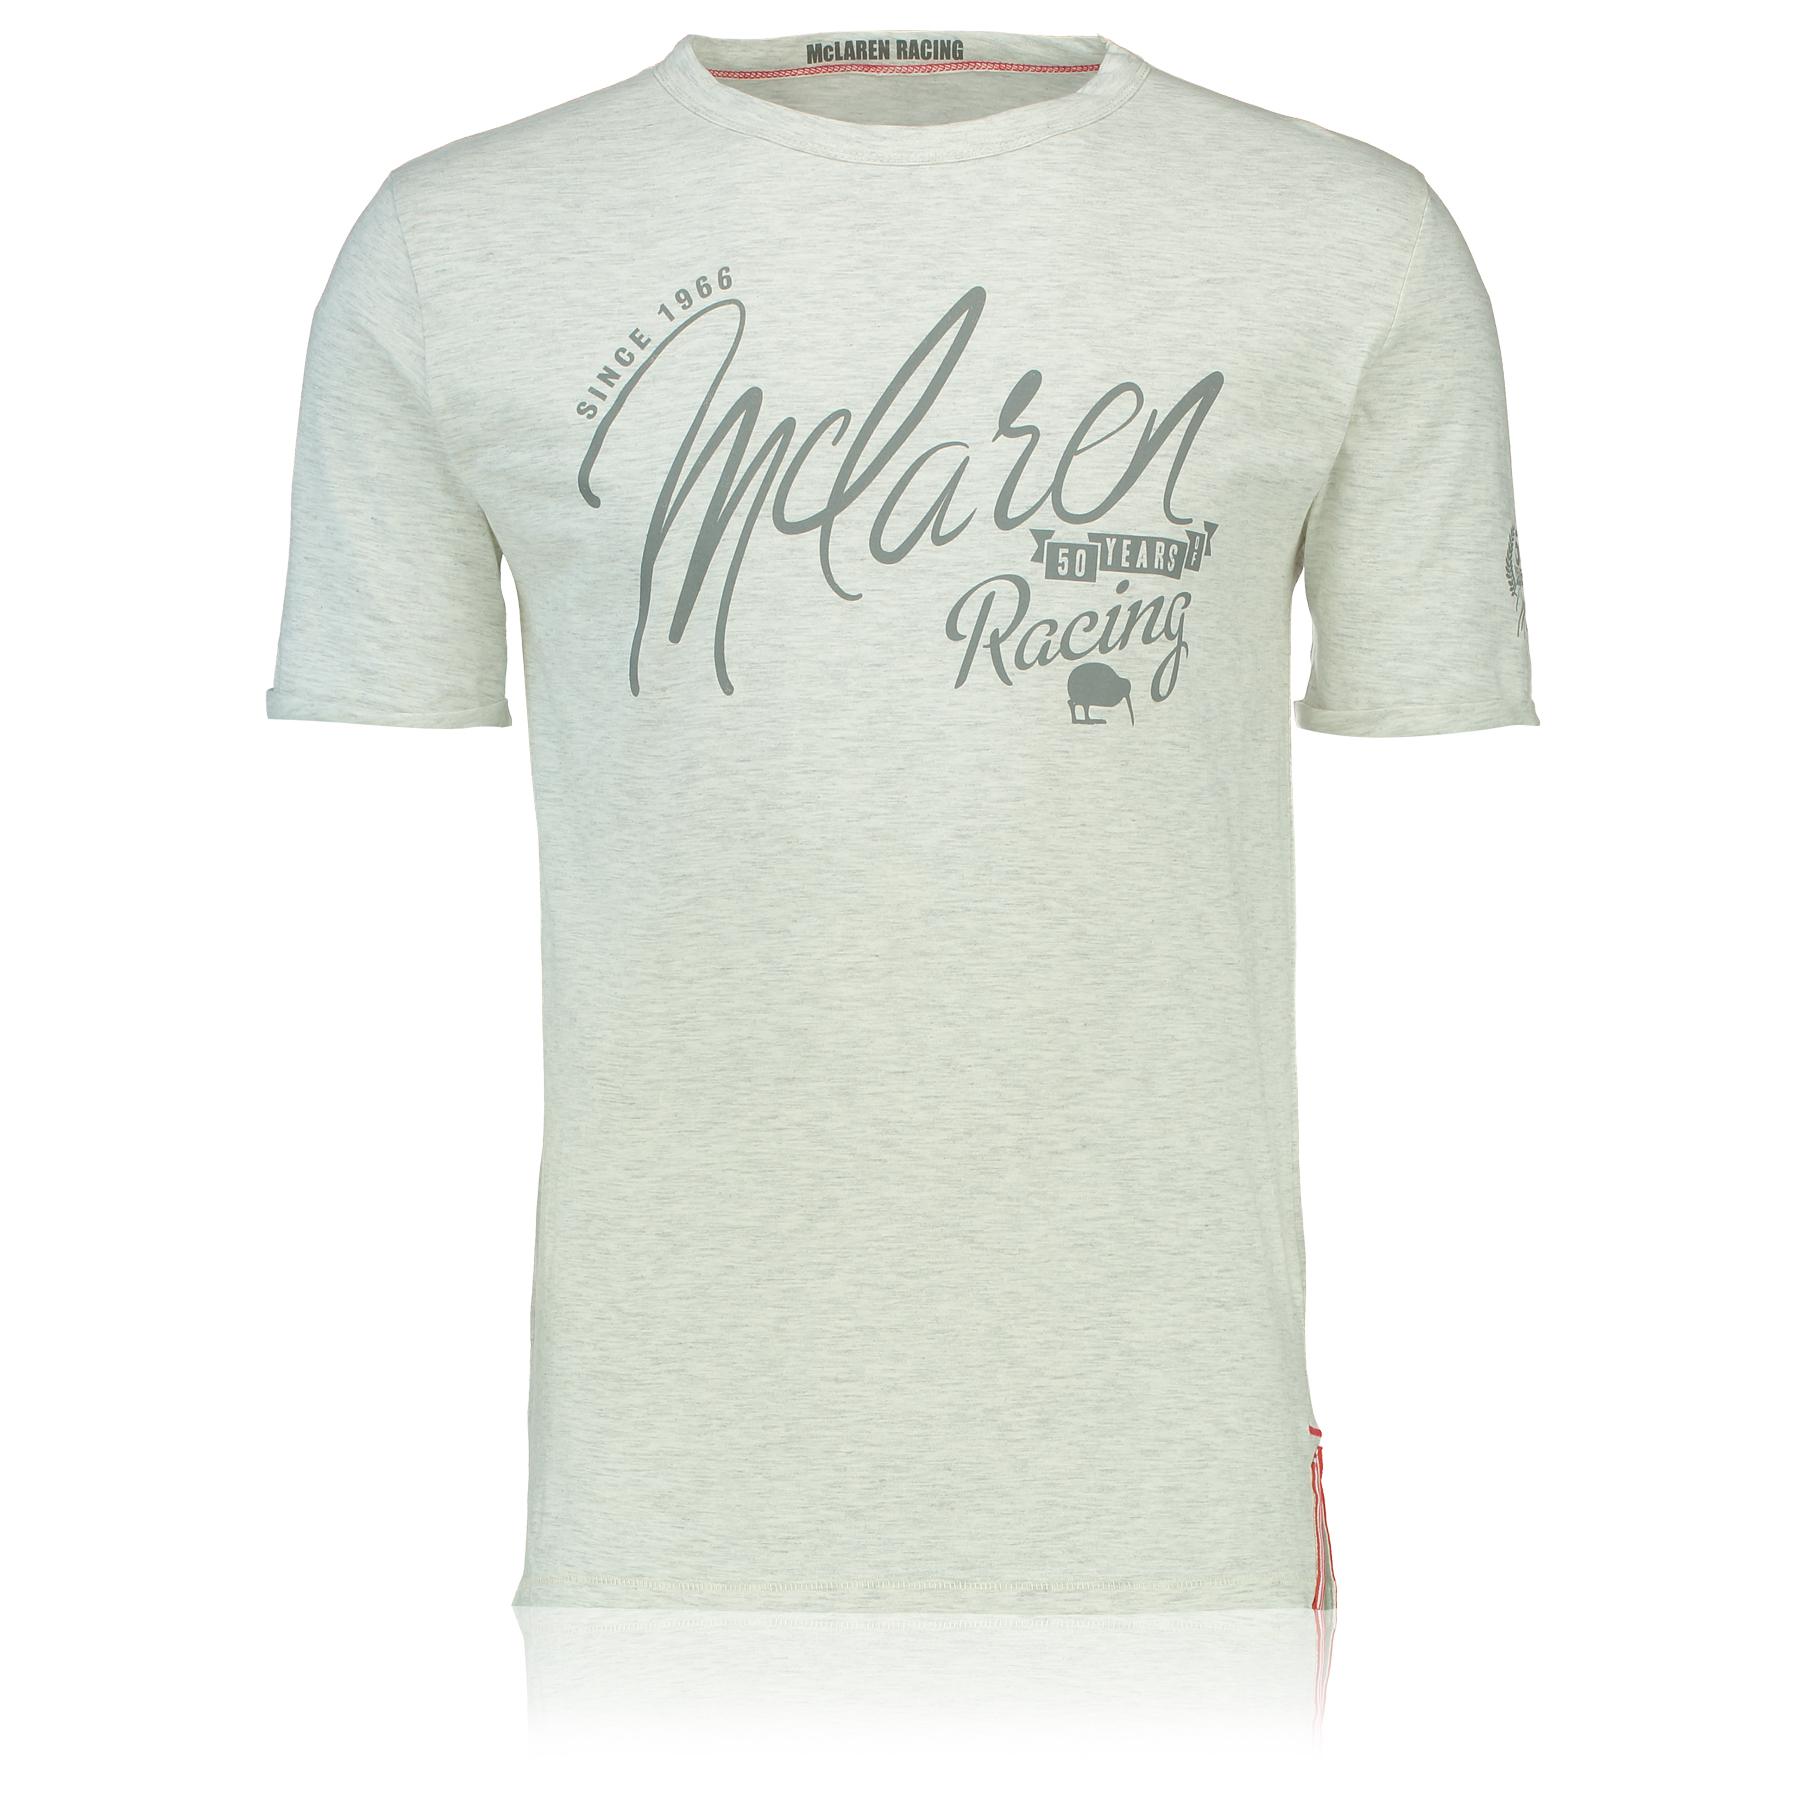 McLaren 50 - FiftyYears of Racing T-Shirt